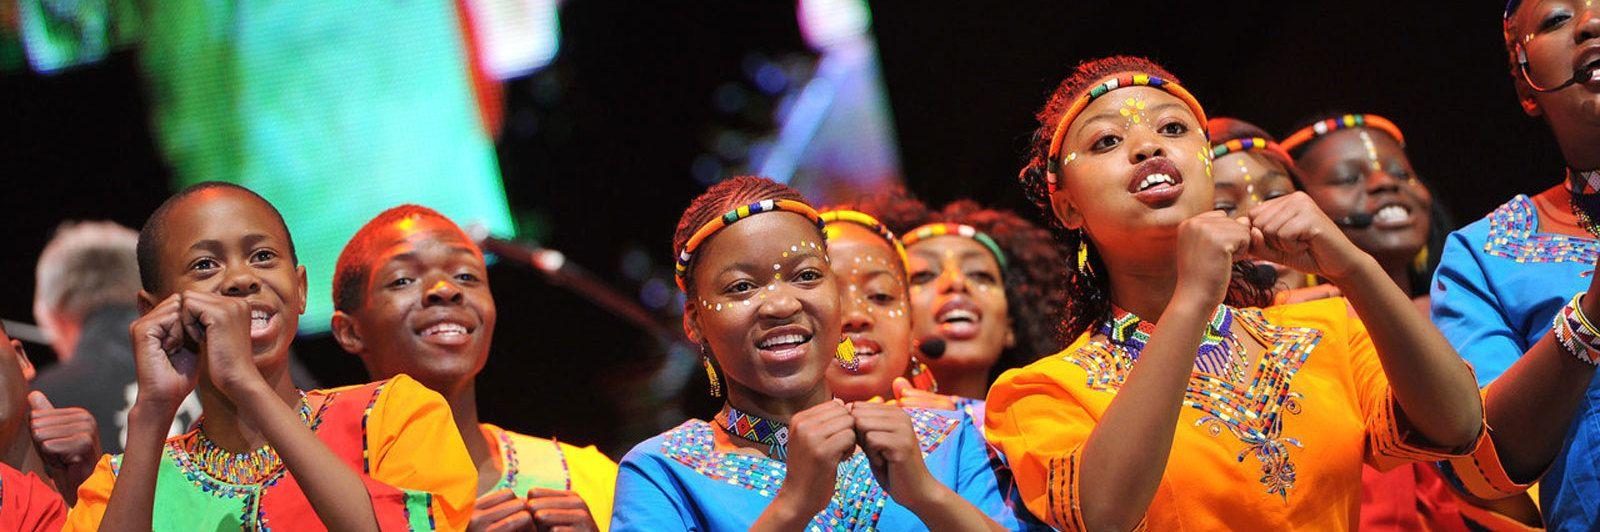 Vusi Mahlasela and Mzansi Youth Choir collaborate